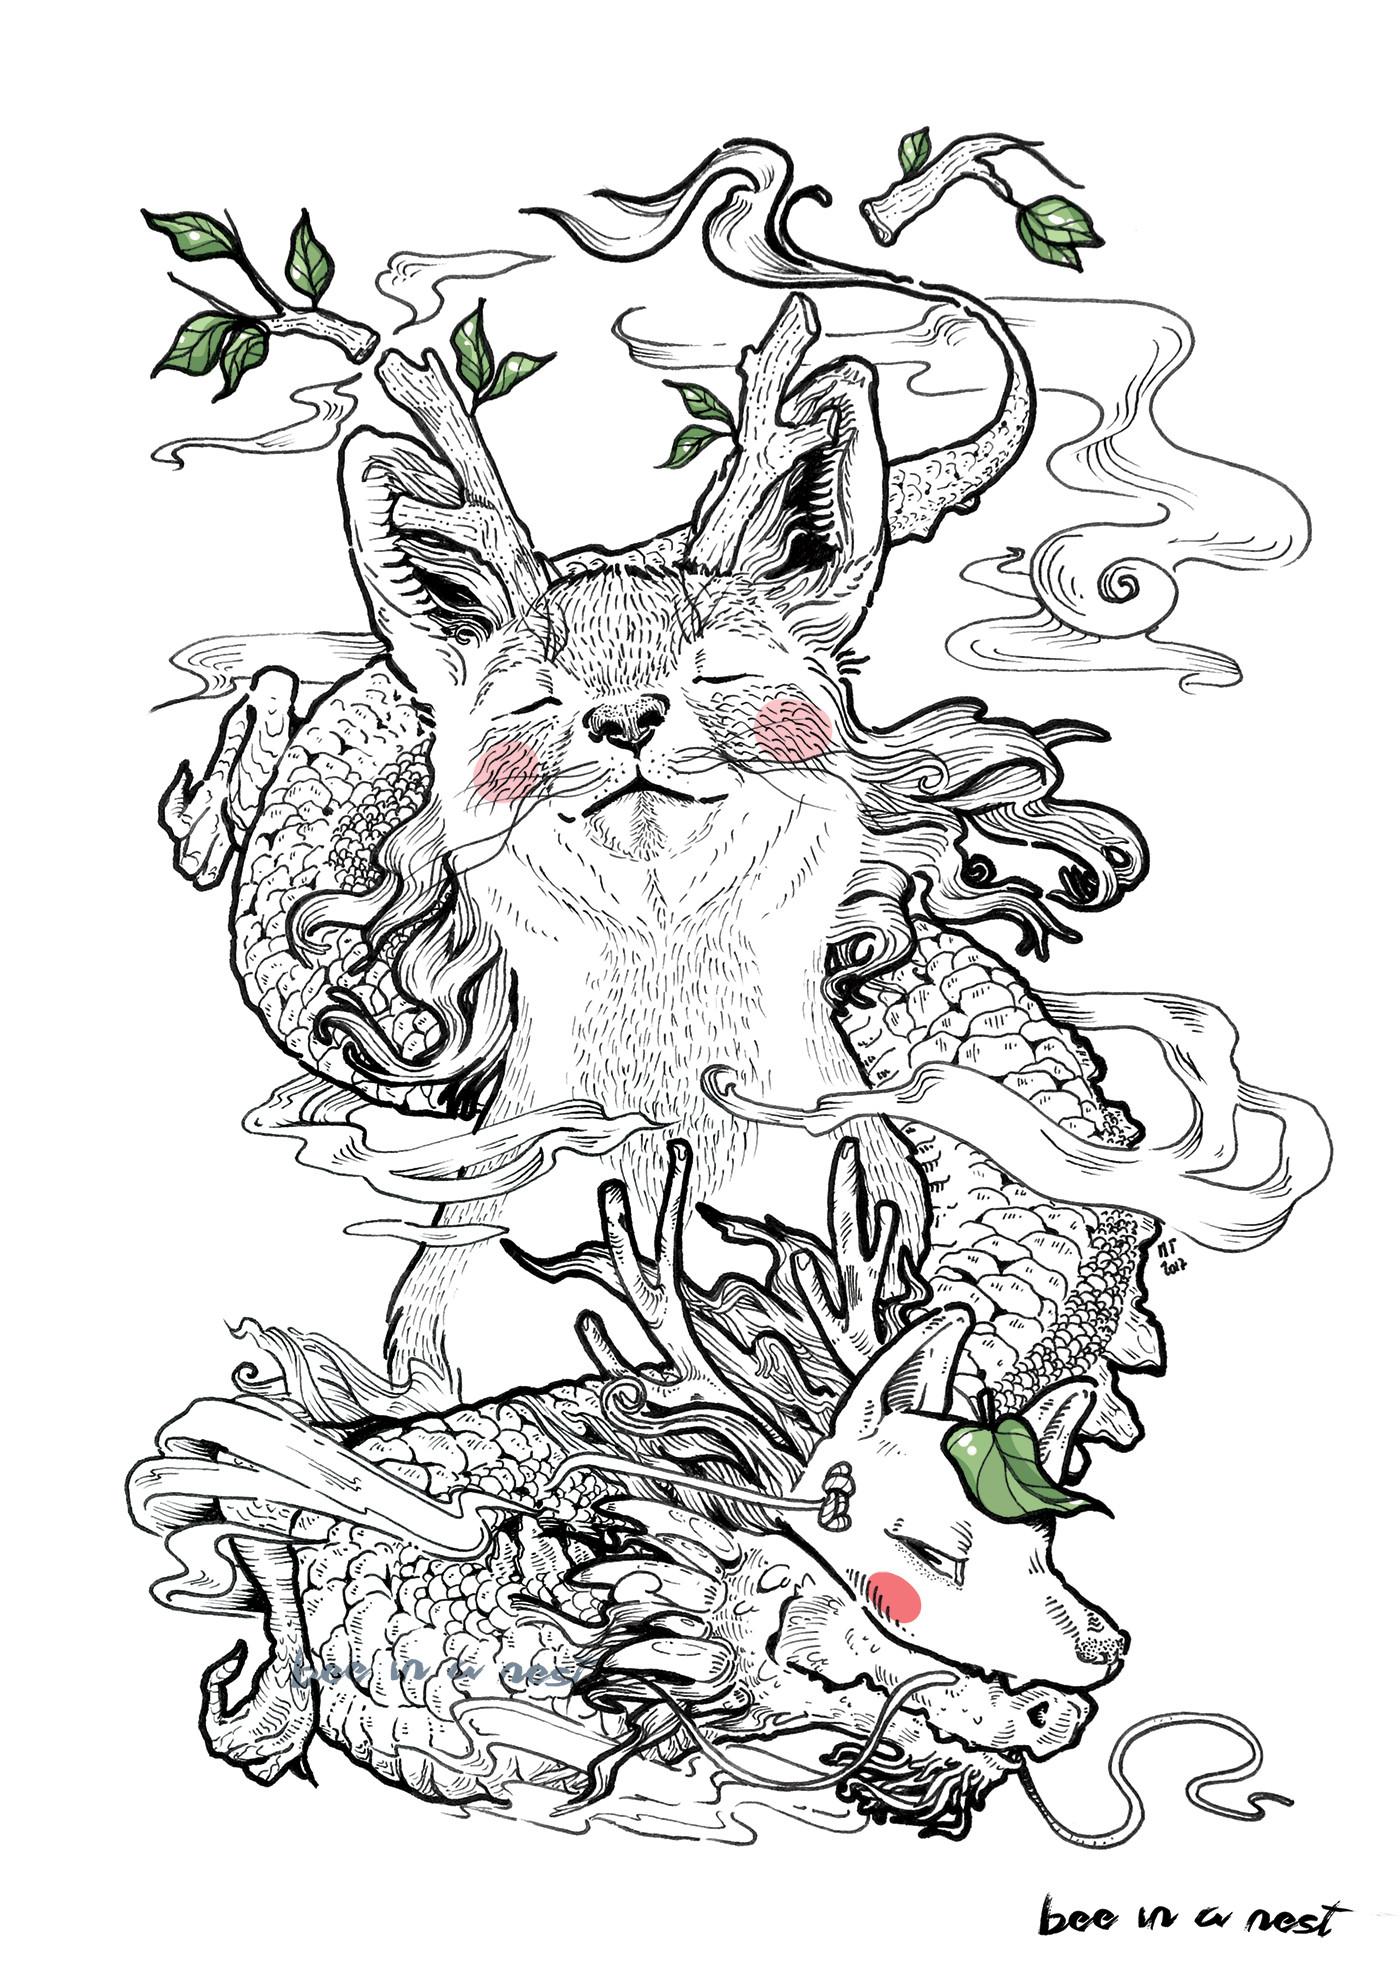 1509532573216-enchanted-fox-michelatannoia.jpg